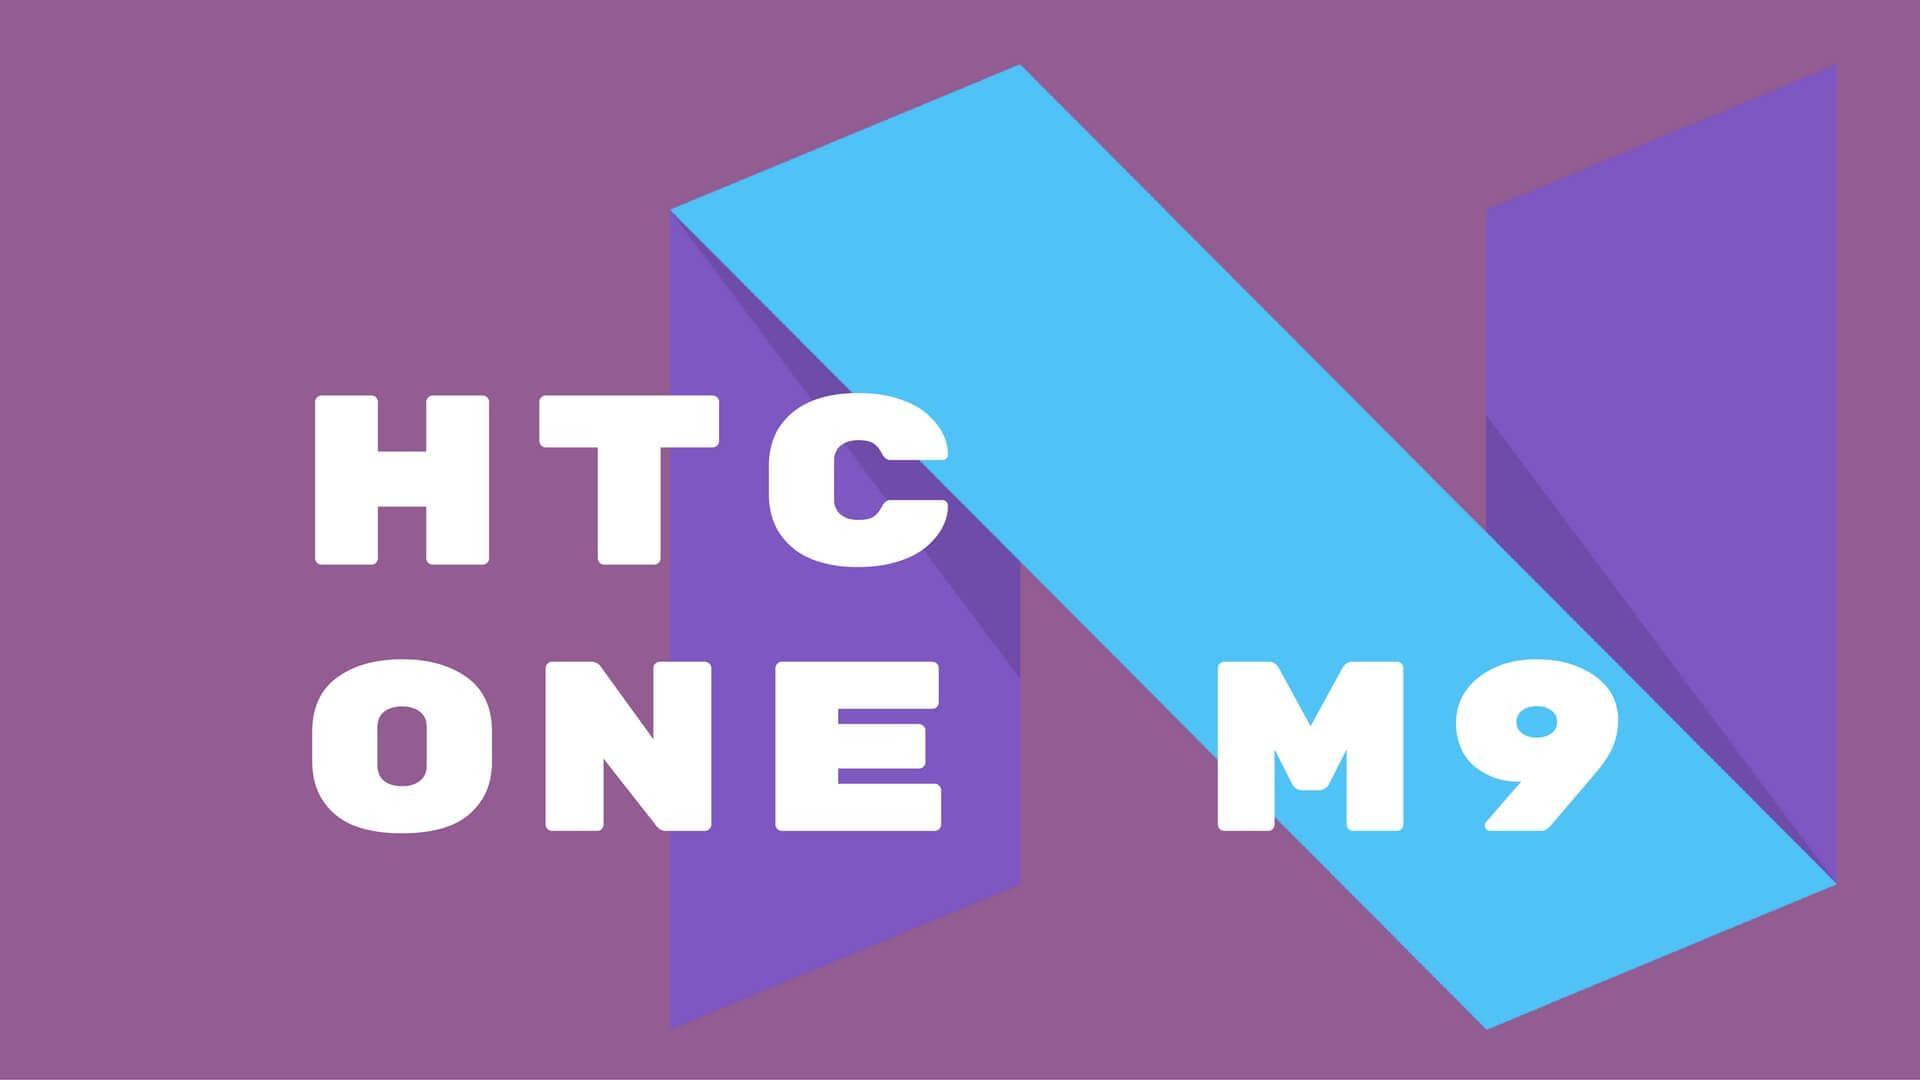 Welche Smartphones bekommen aktuell Android 7 Nougat? techboys.de • smarte News, auf den Punkt!